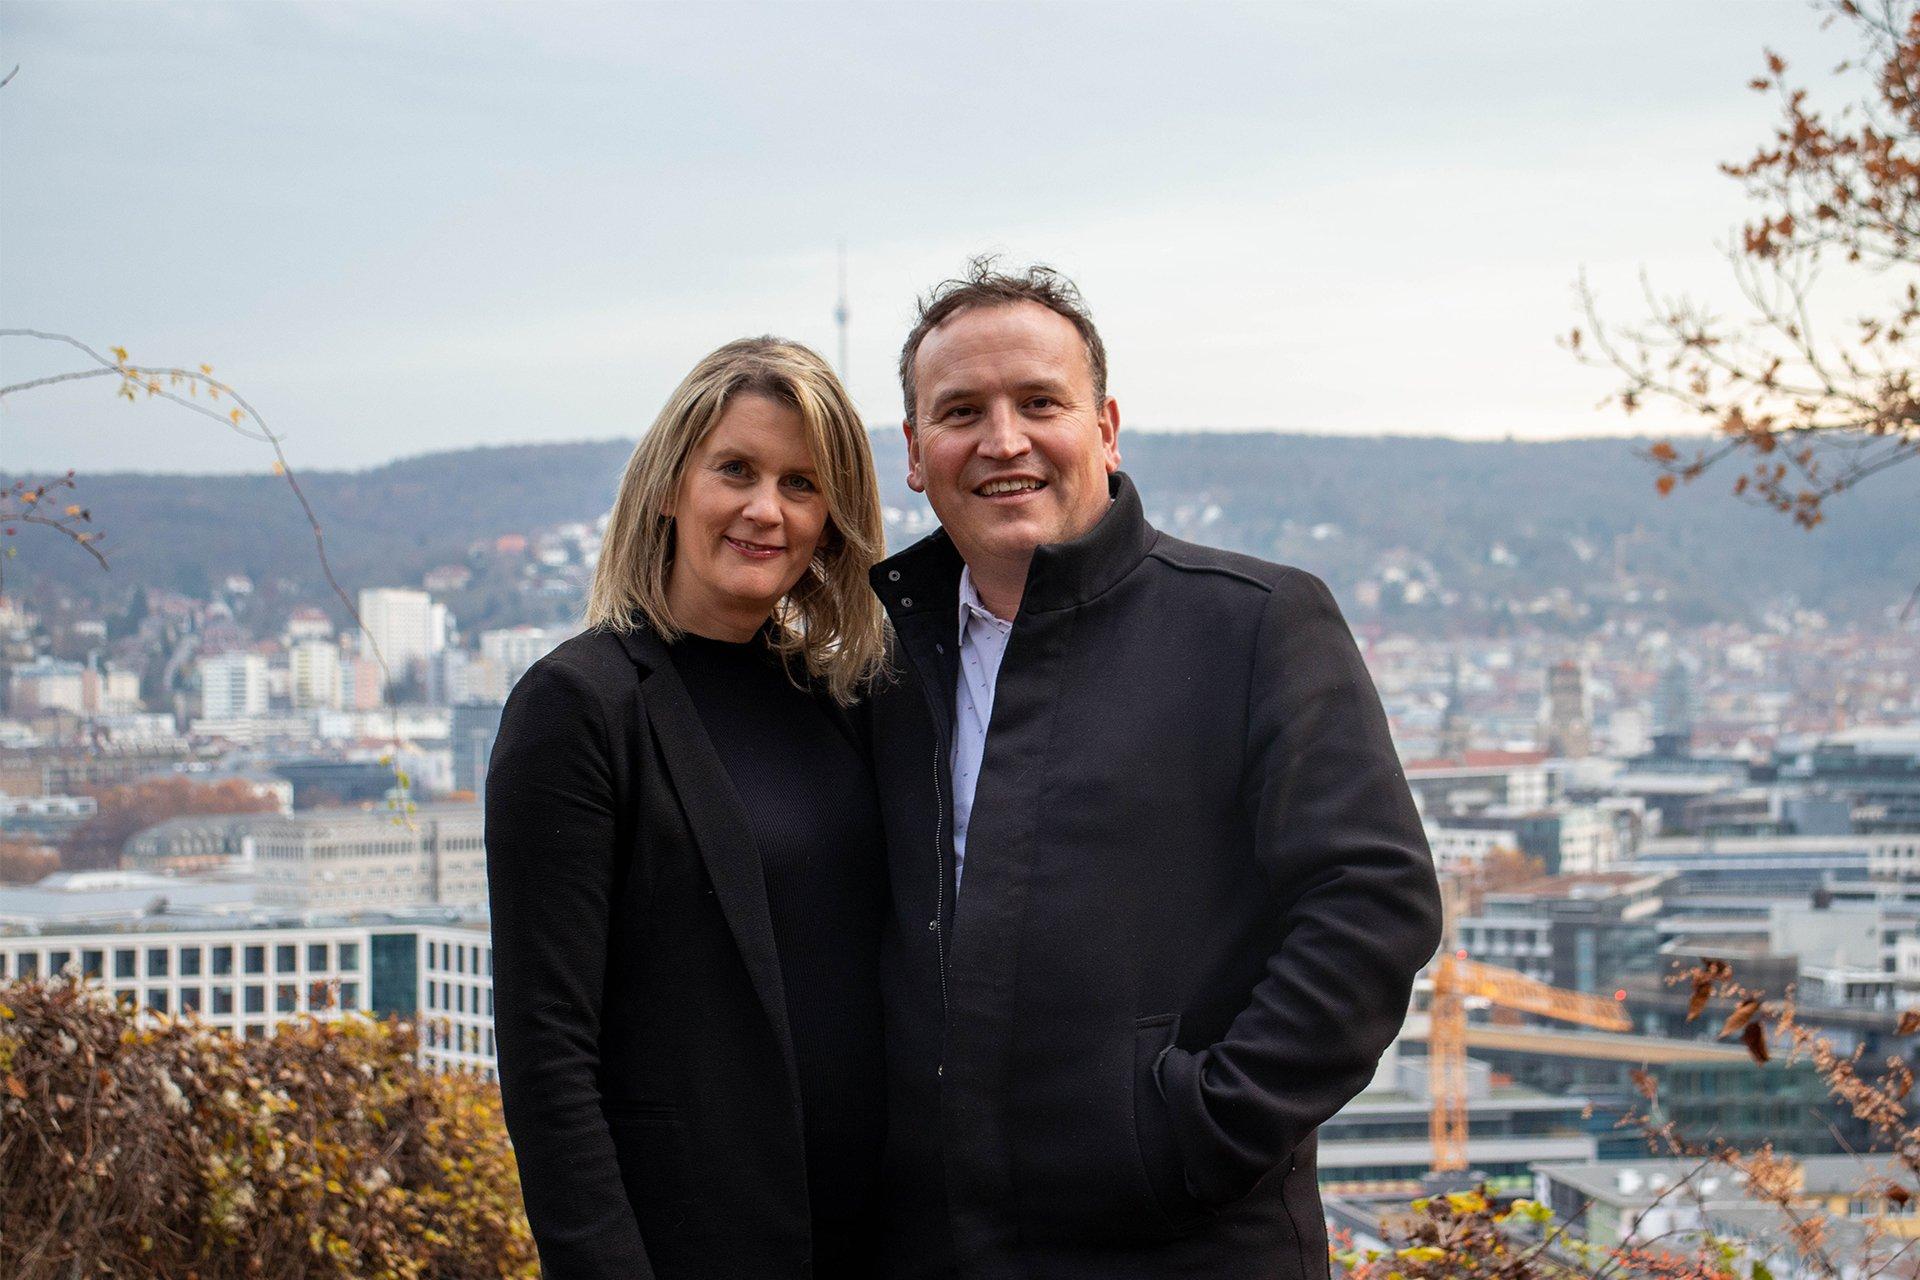 Dan Schmid and Karin Schmid